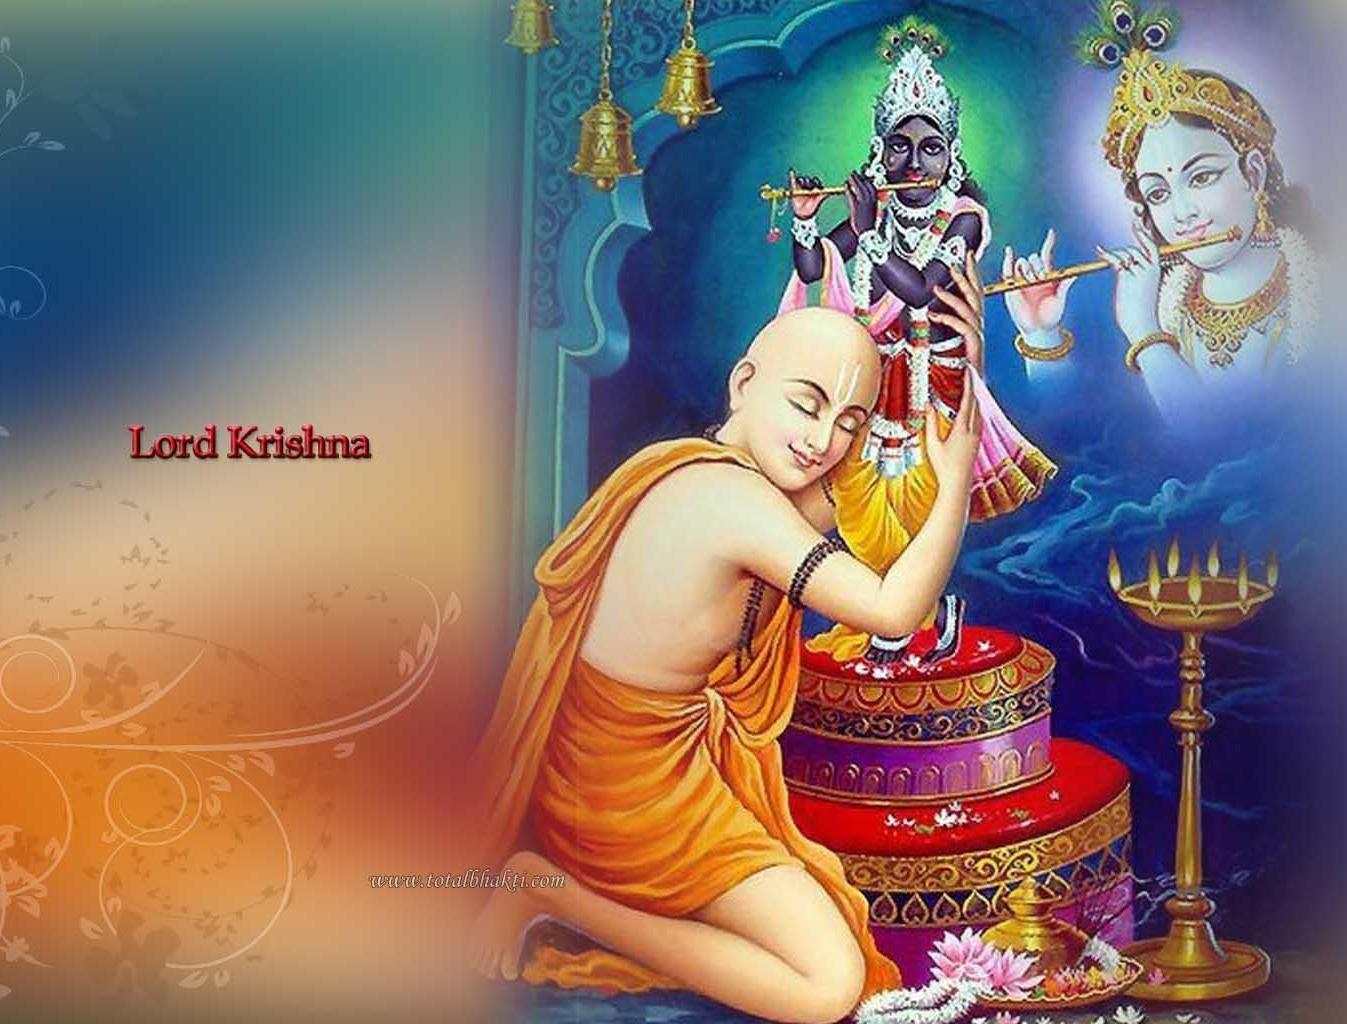 Wallpaper download bhakti -